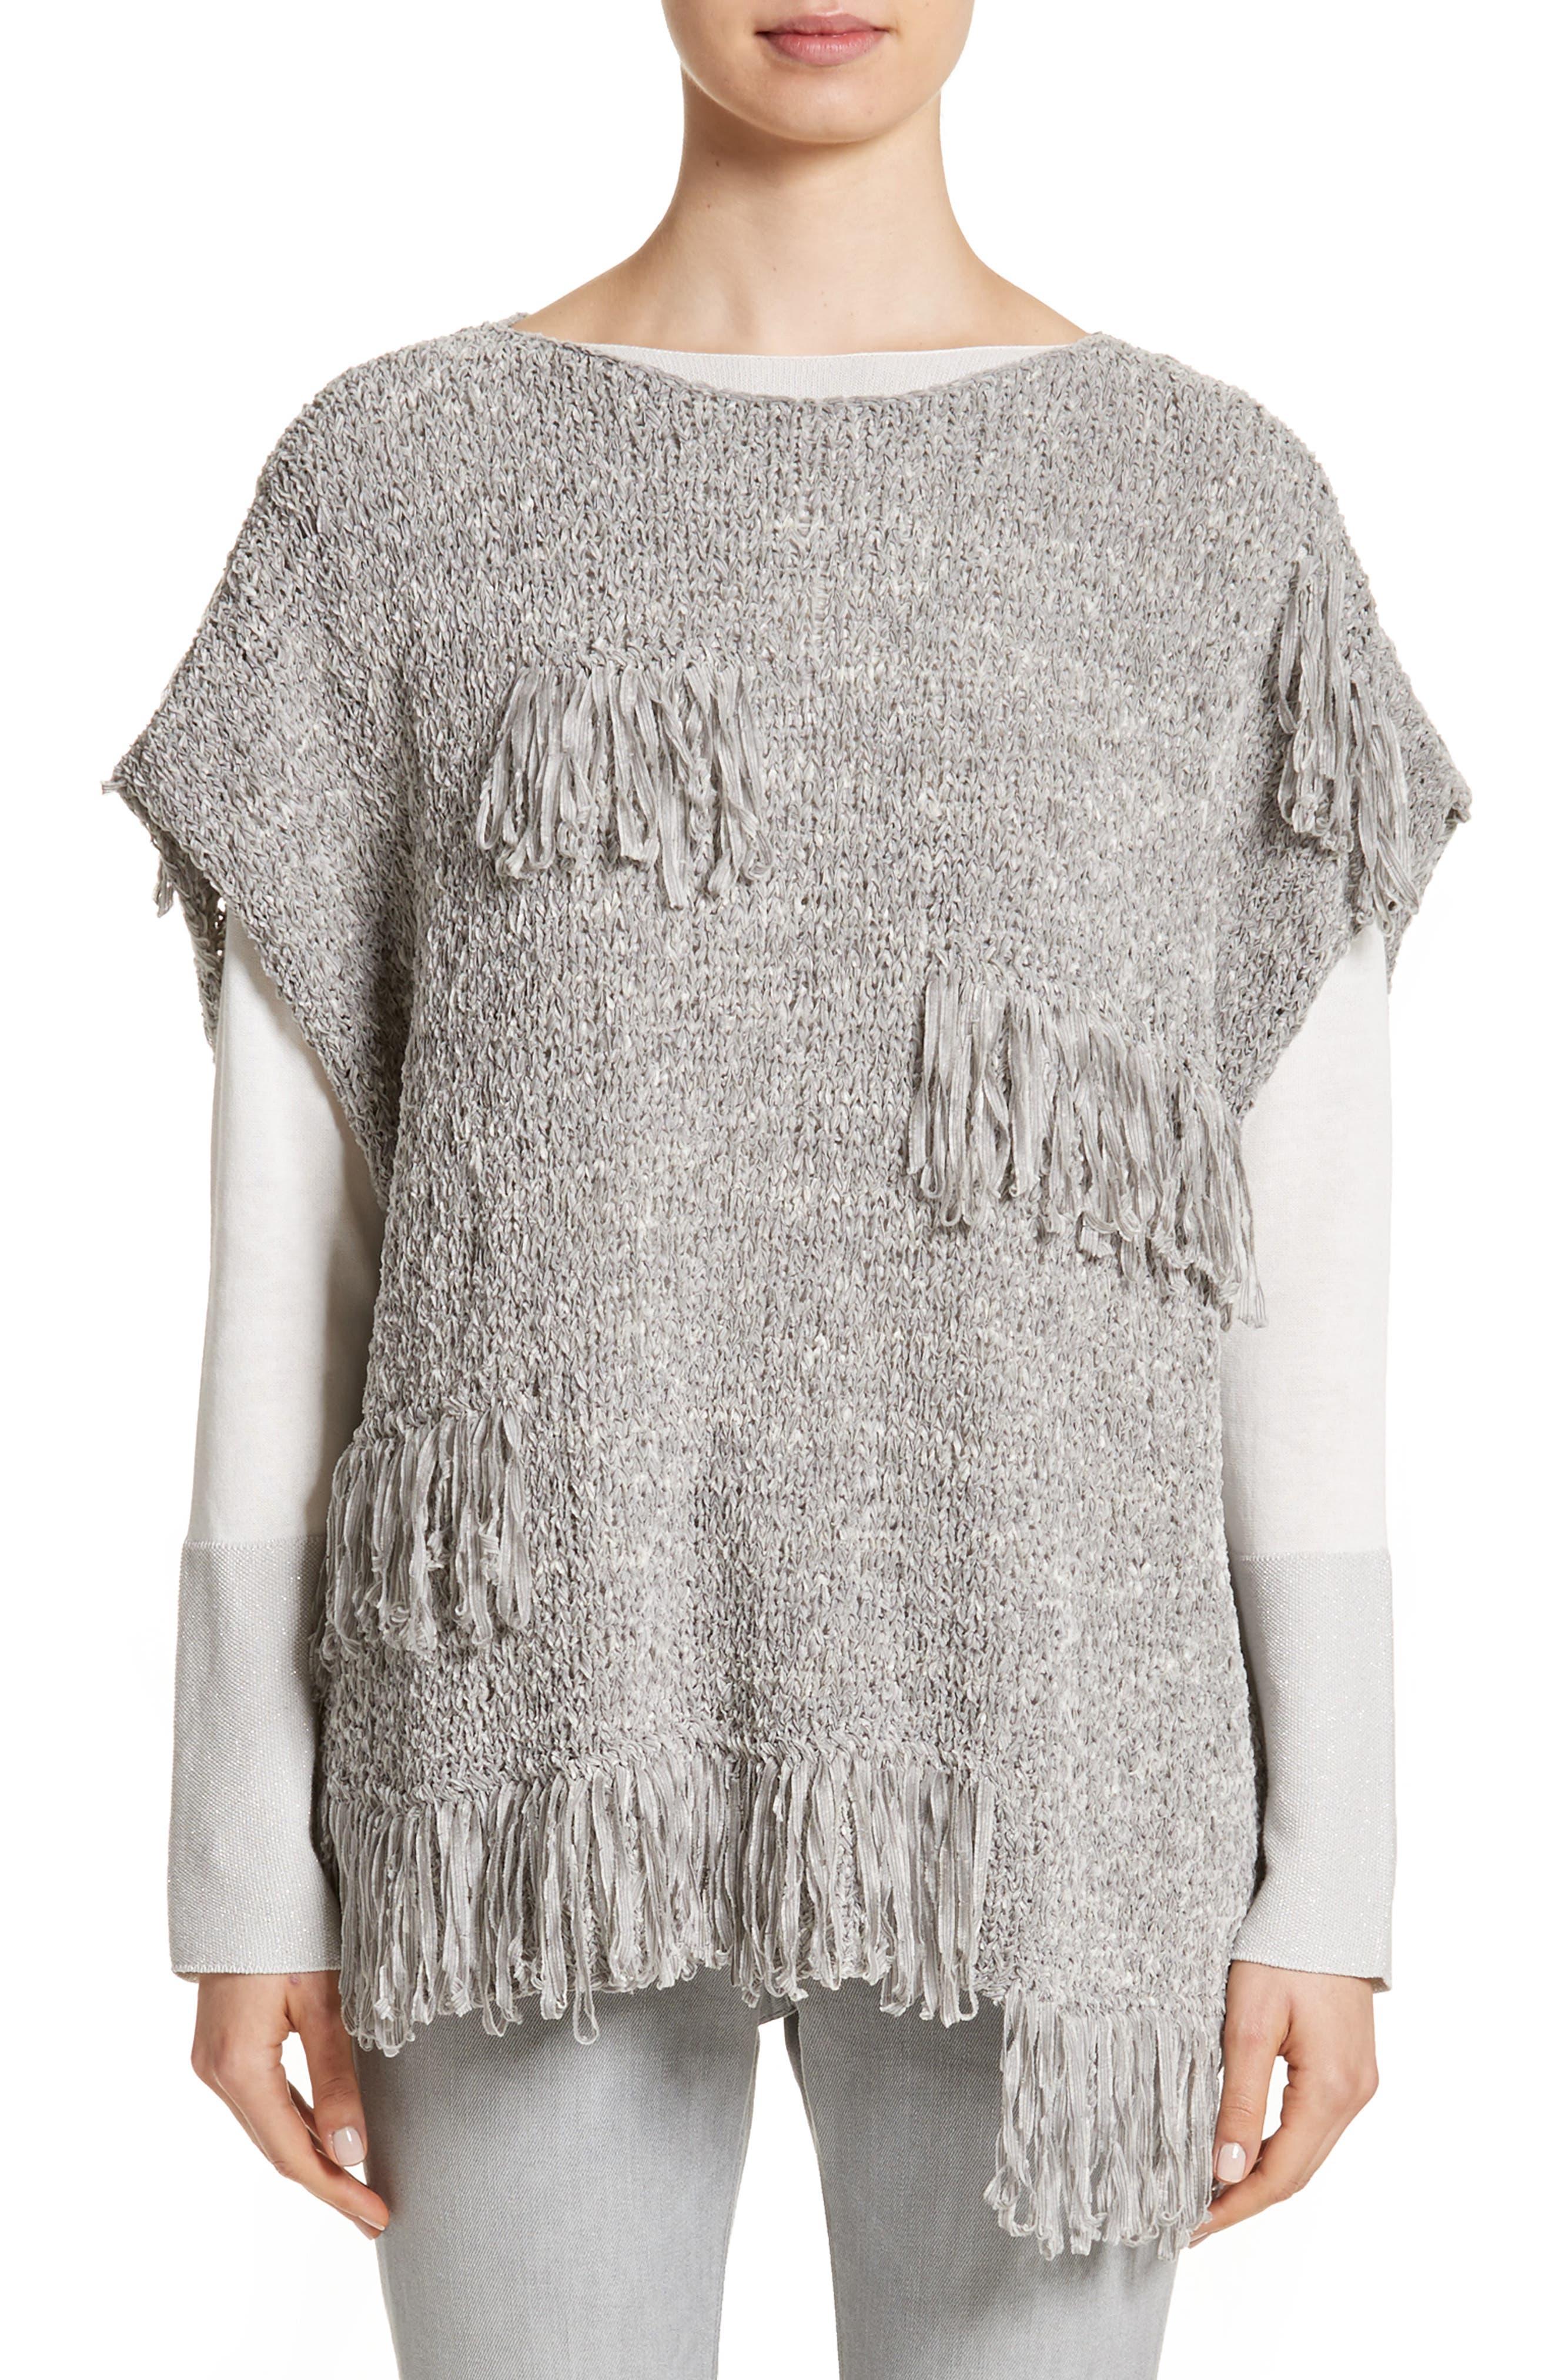 Fringe Chenille Knit Poncho Sweater,                             Main thumbnail 1, color,                             020